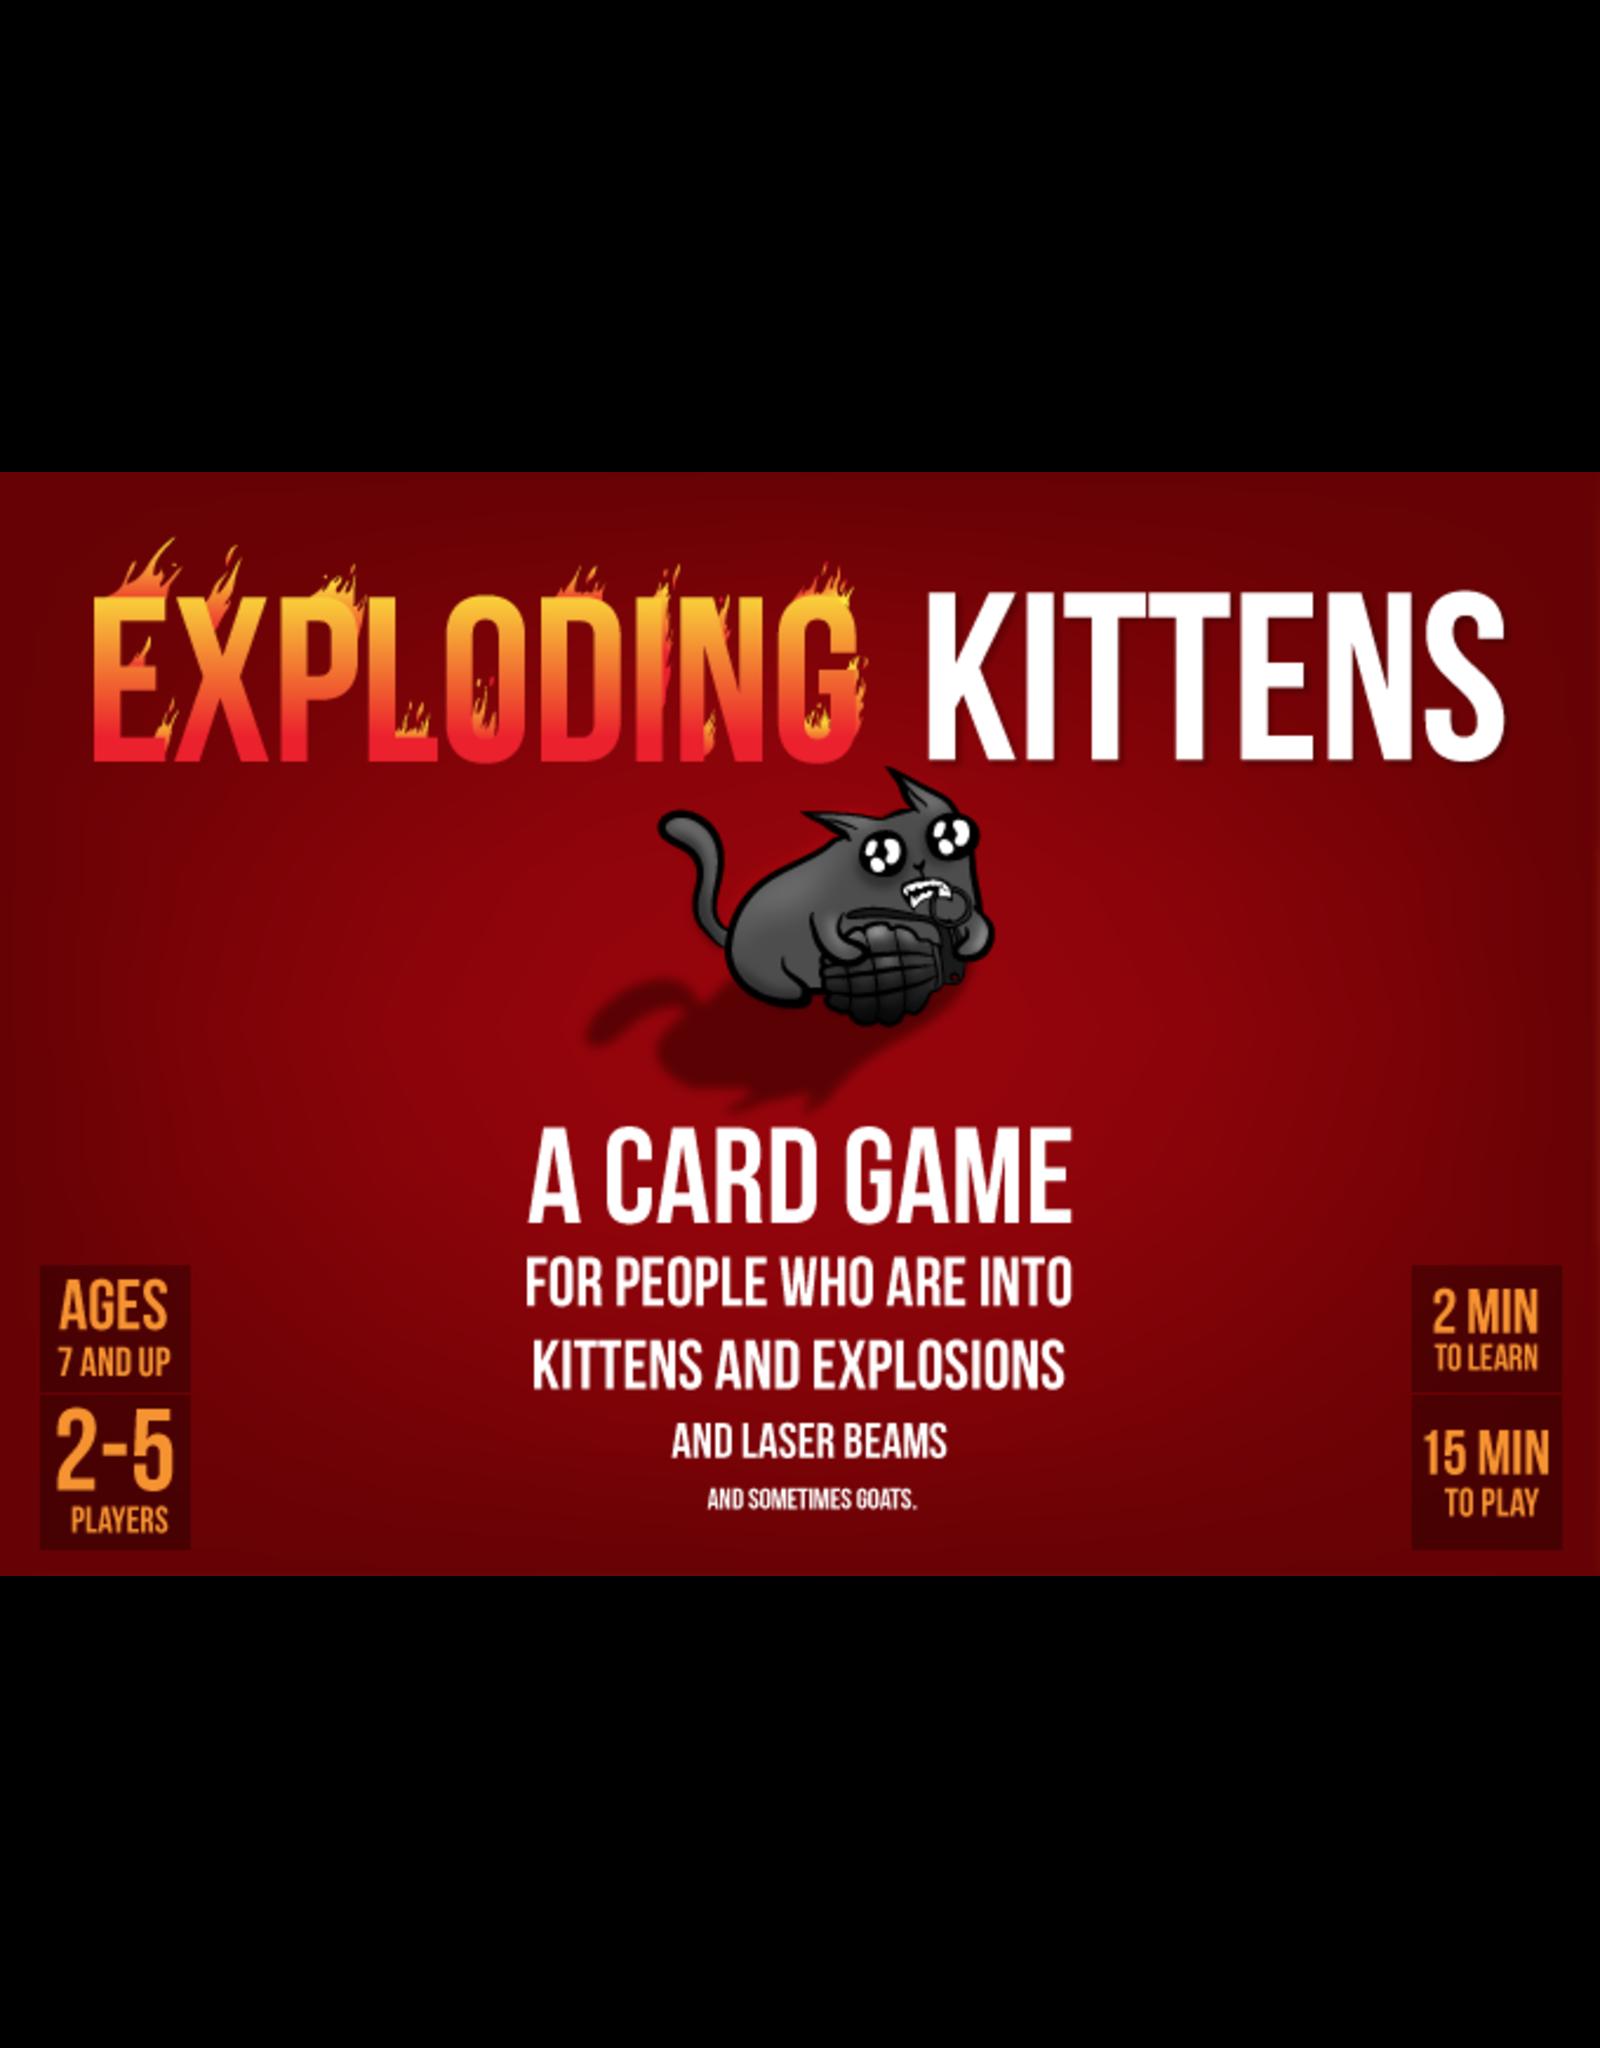 ALLIANCE GAMES DISTRIBUTORS EXPLODING KITTENS ORIGINAL ED CARD GAME